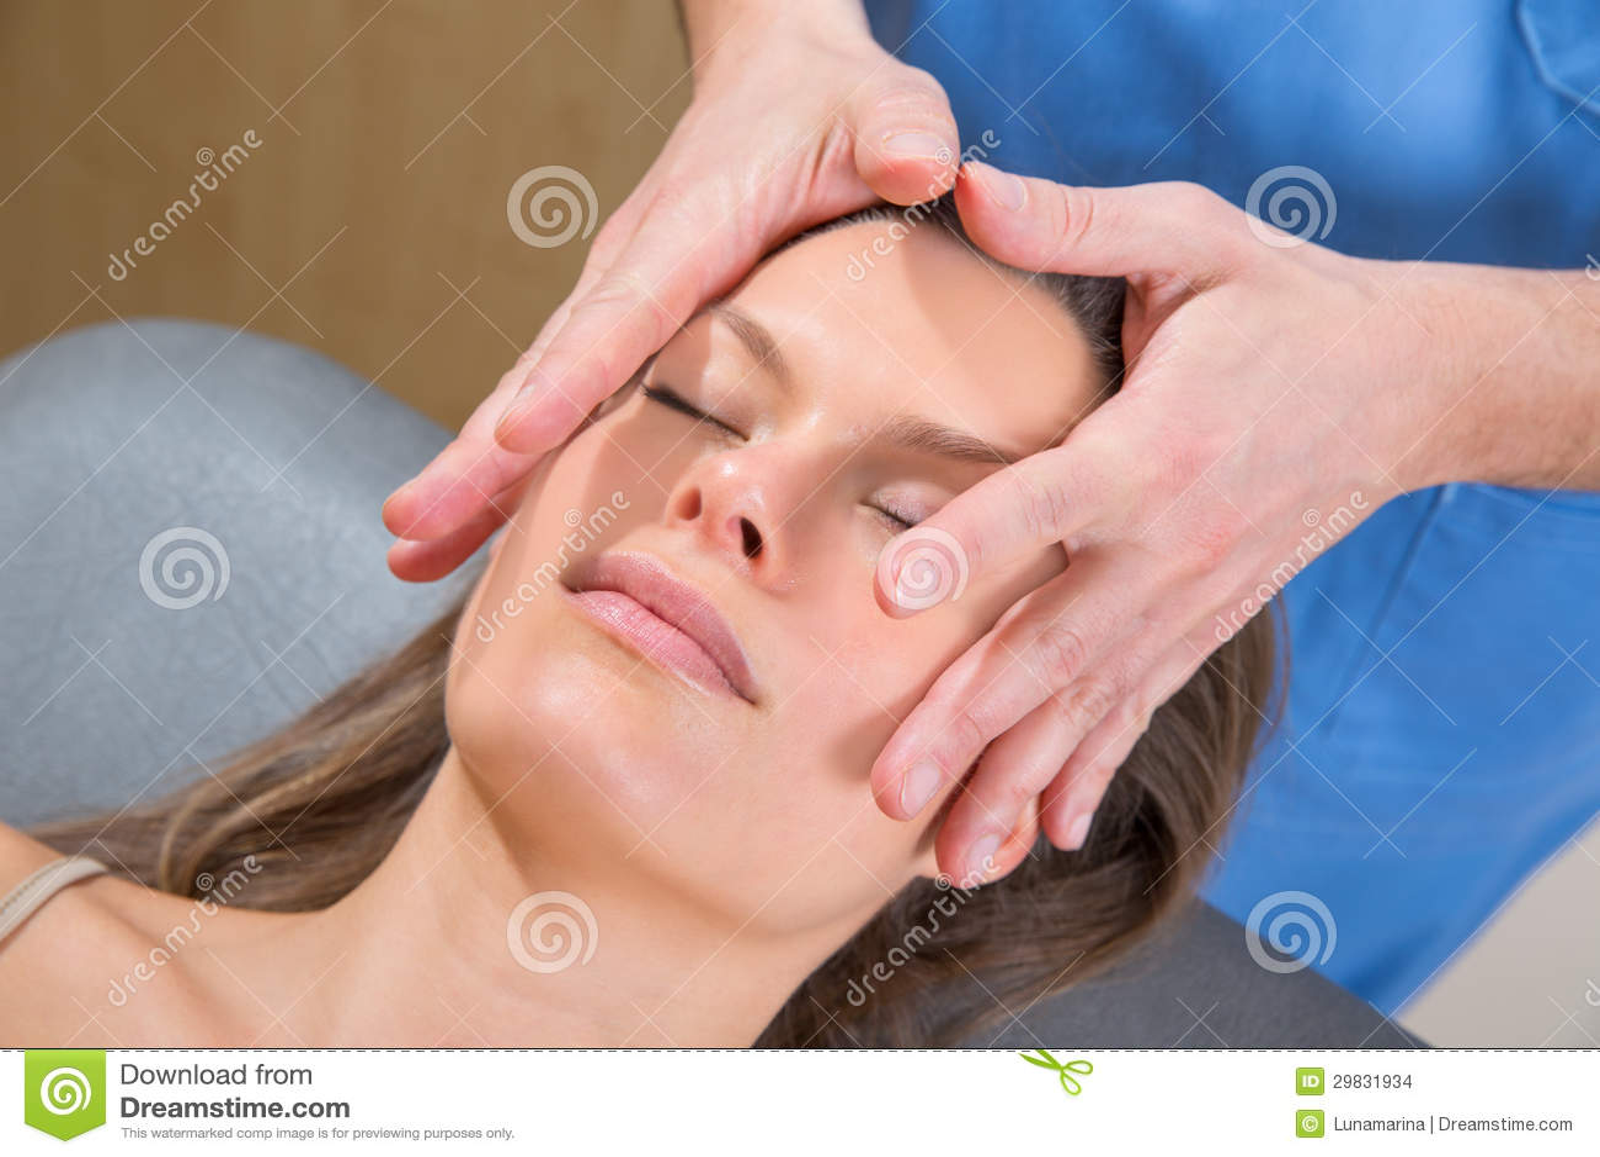 Massage therapist facial